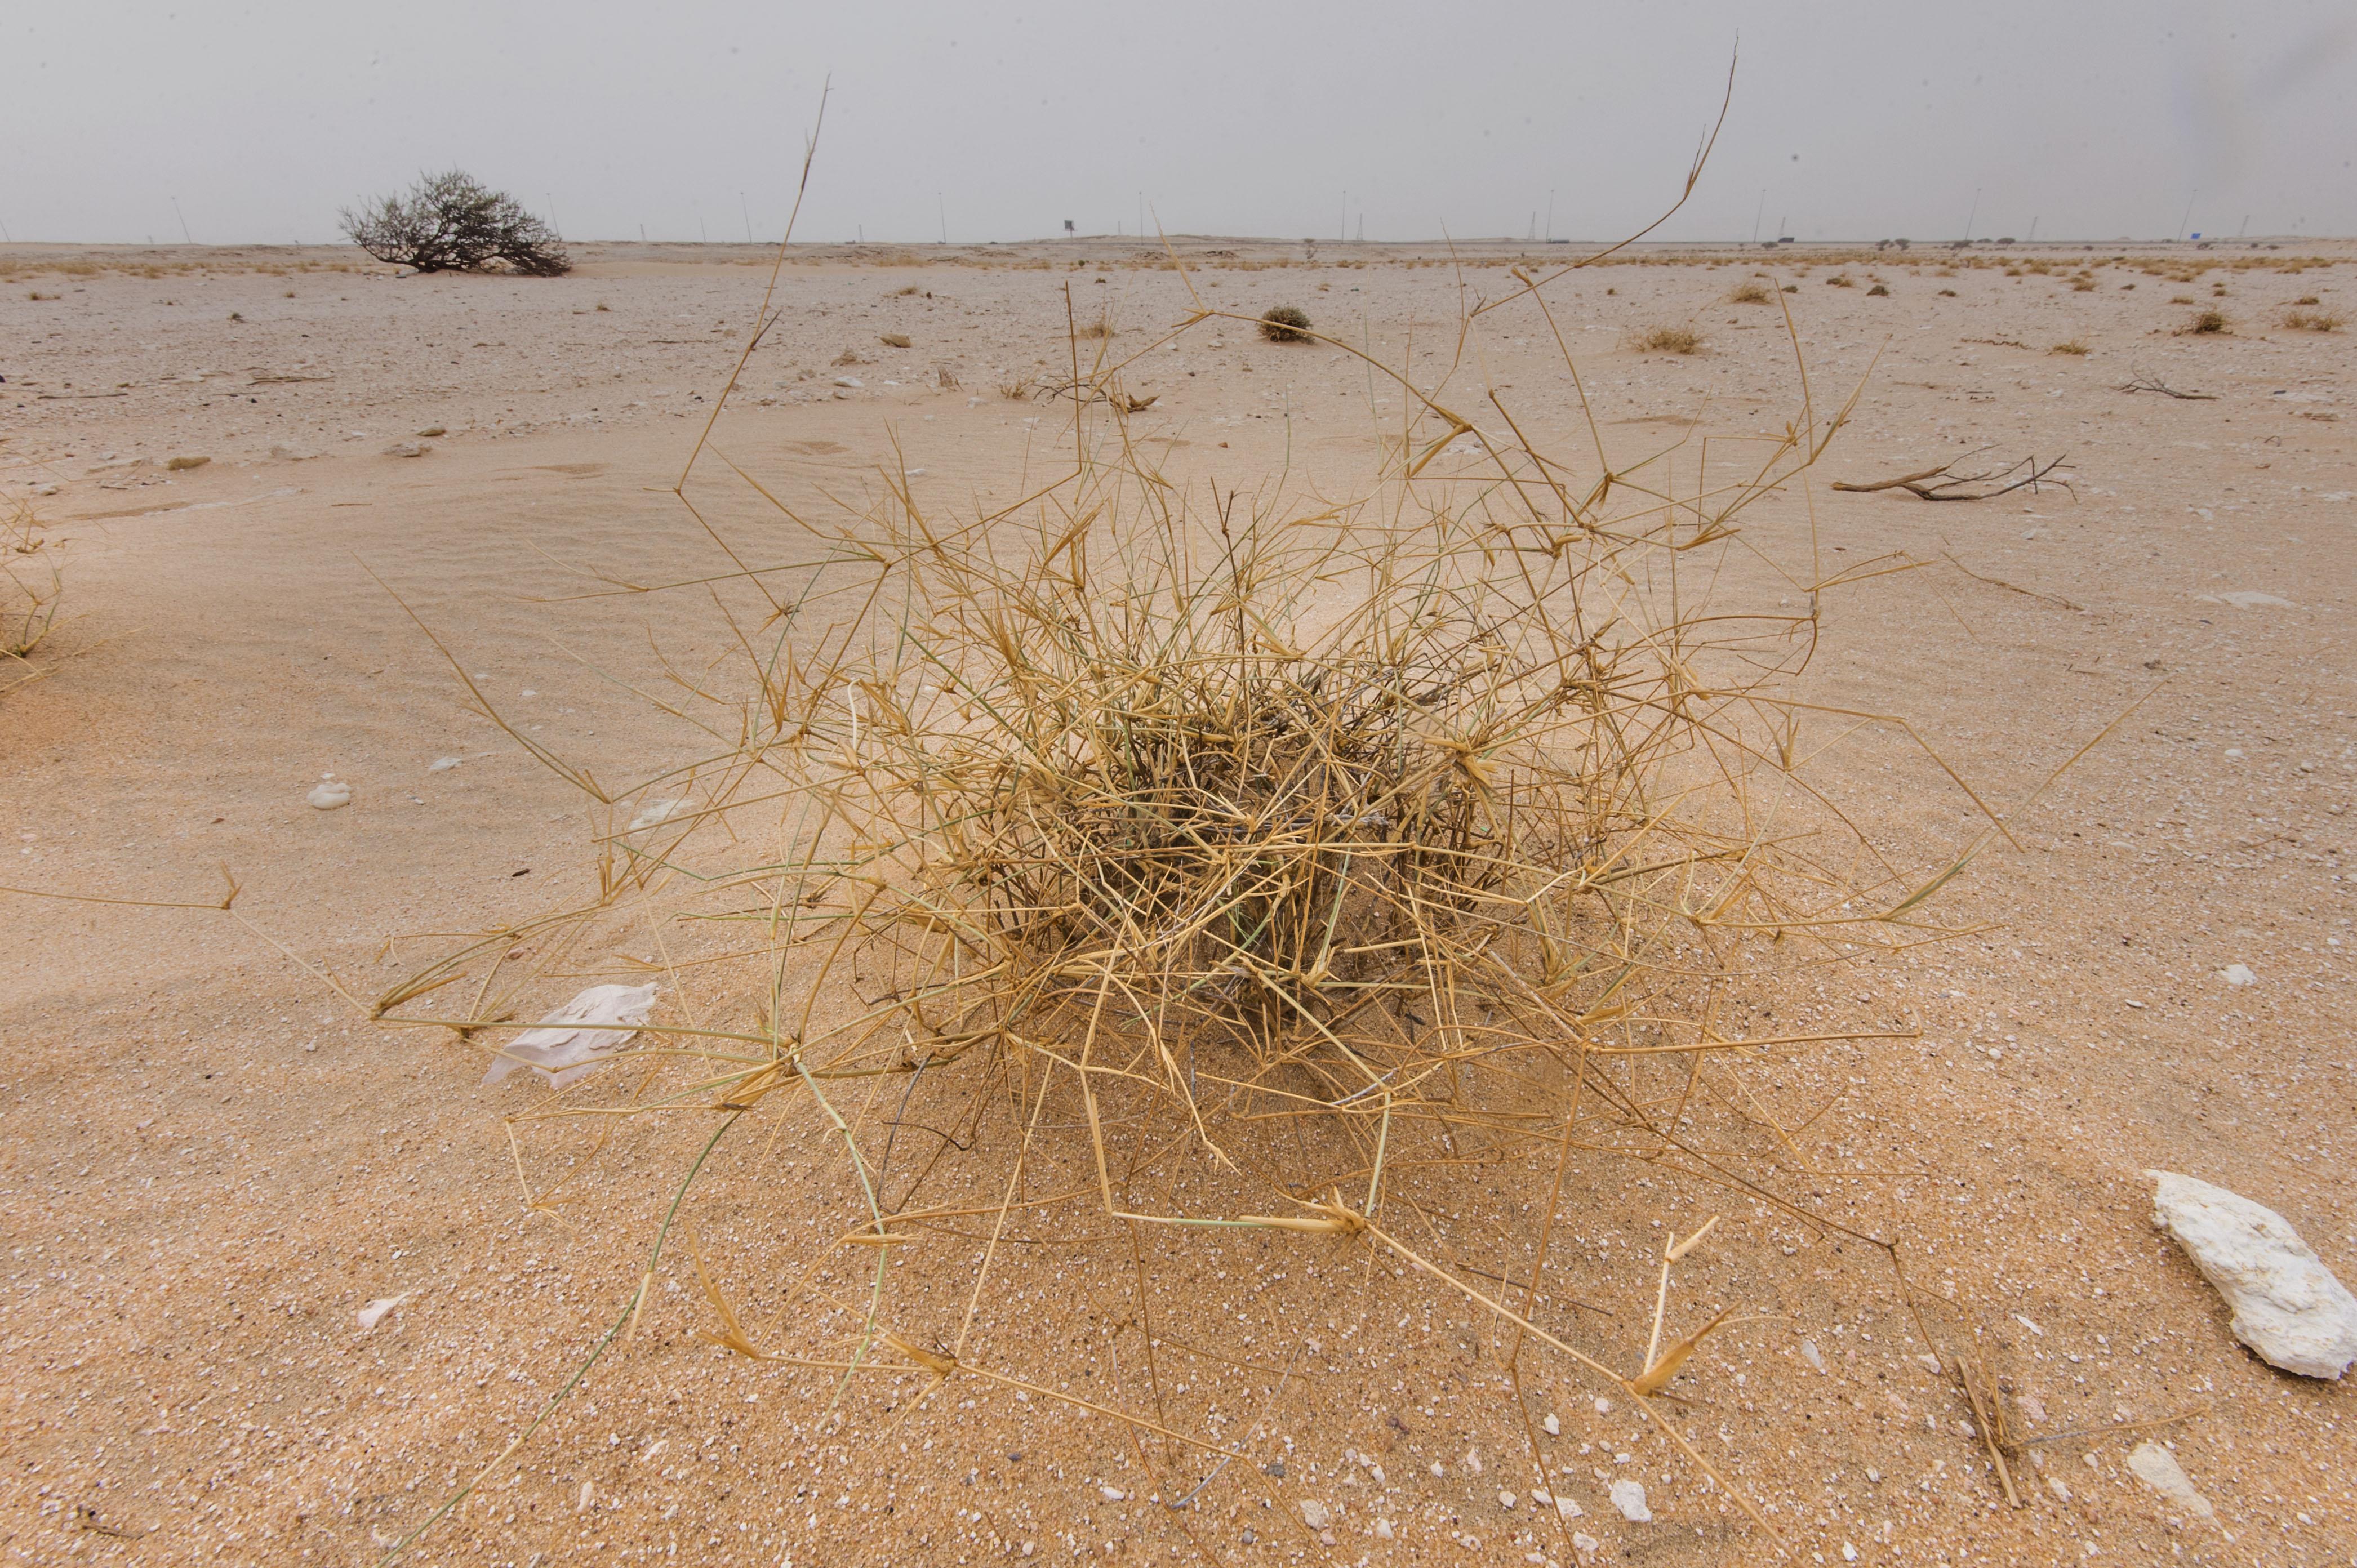 photo 1591 29 desert grass panicum turgidum in area of. Black Bedroom Furniture Sets. Home Design Ideas